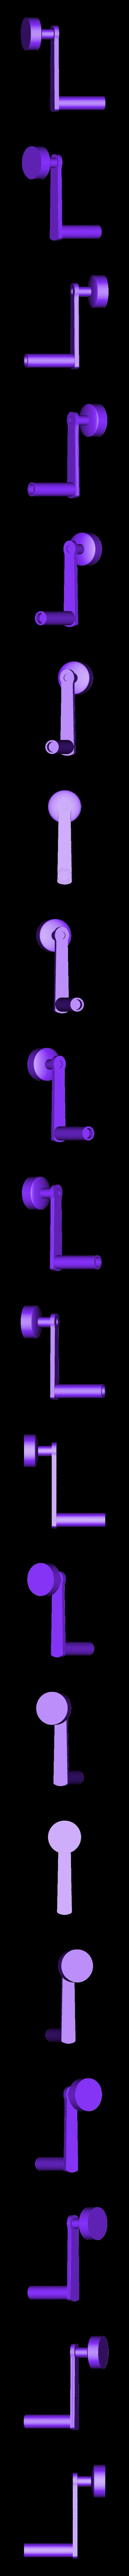 Tapion's Music Box - Crank.stl Télécharger fichier STL Tapion Music Box - Dragon Ball • Plan pour impression 3D, BODY3D